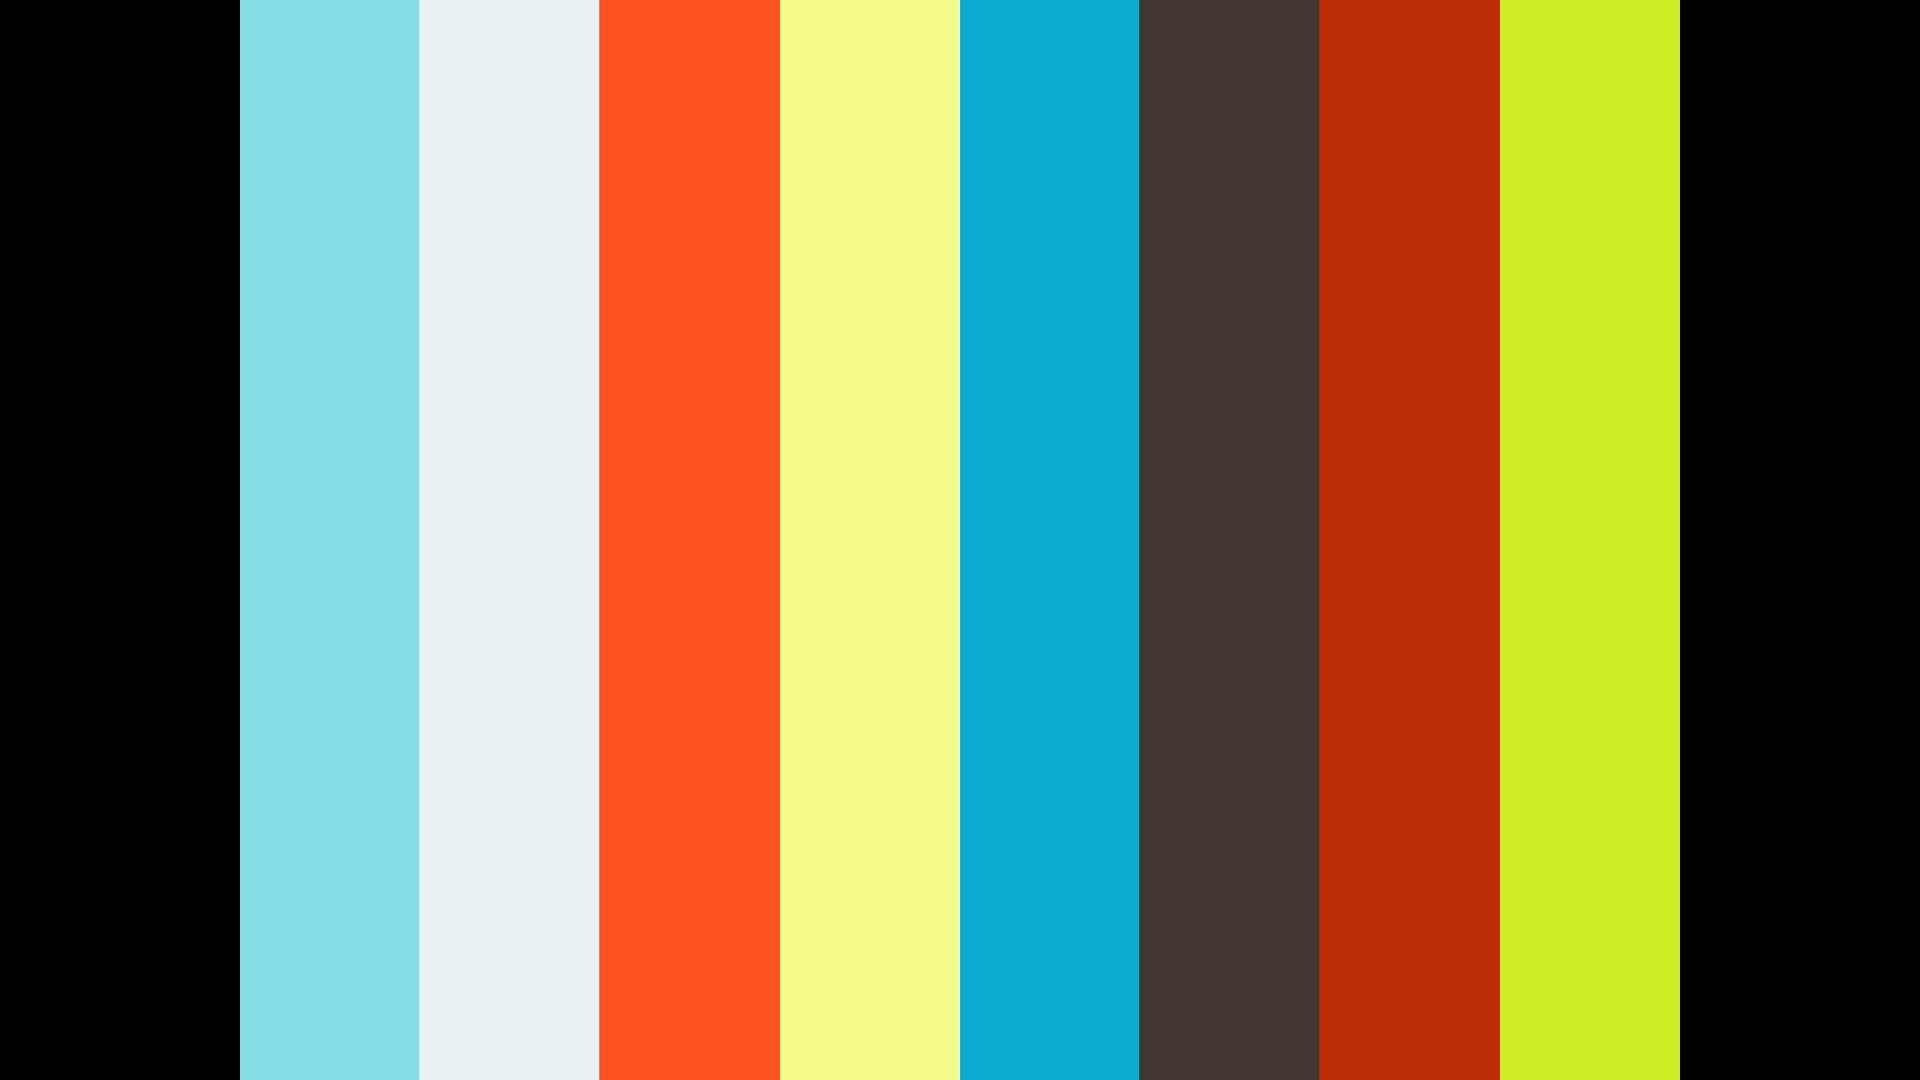 De-focus bokeh leak light orange and shine  - Free Footage